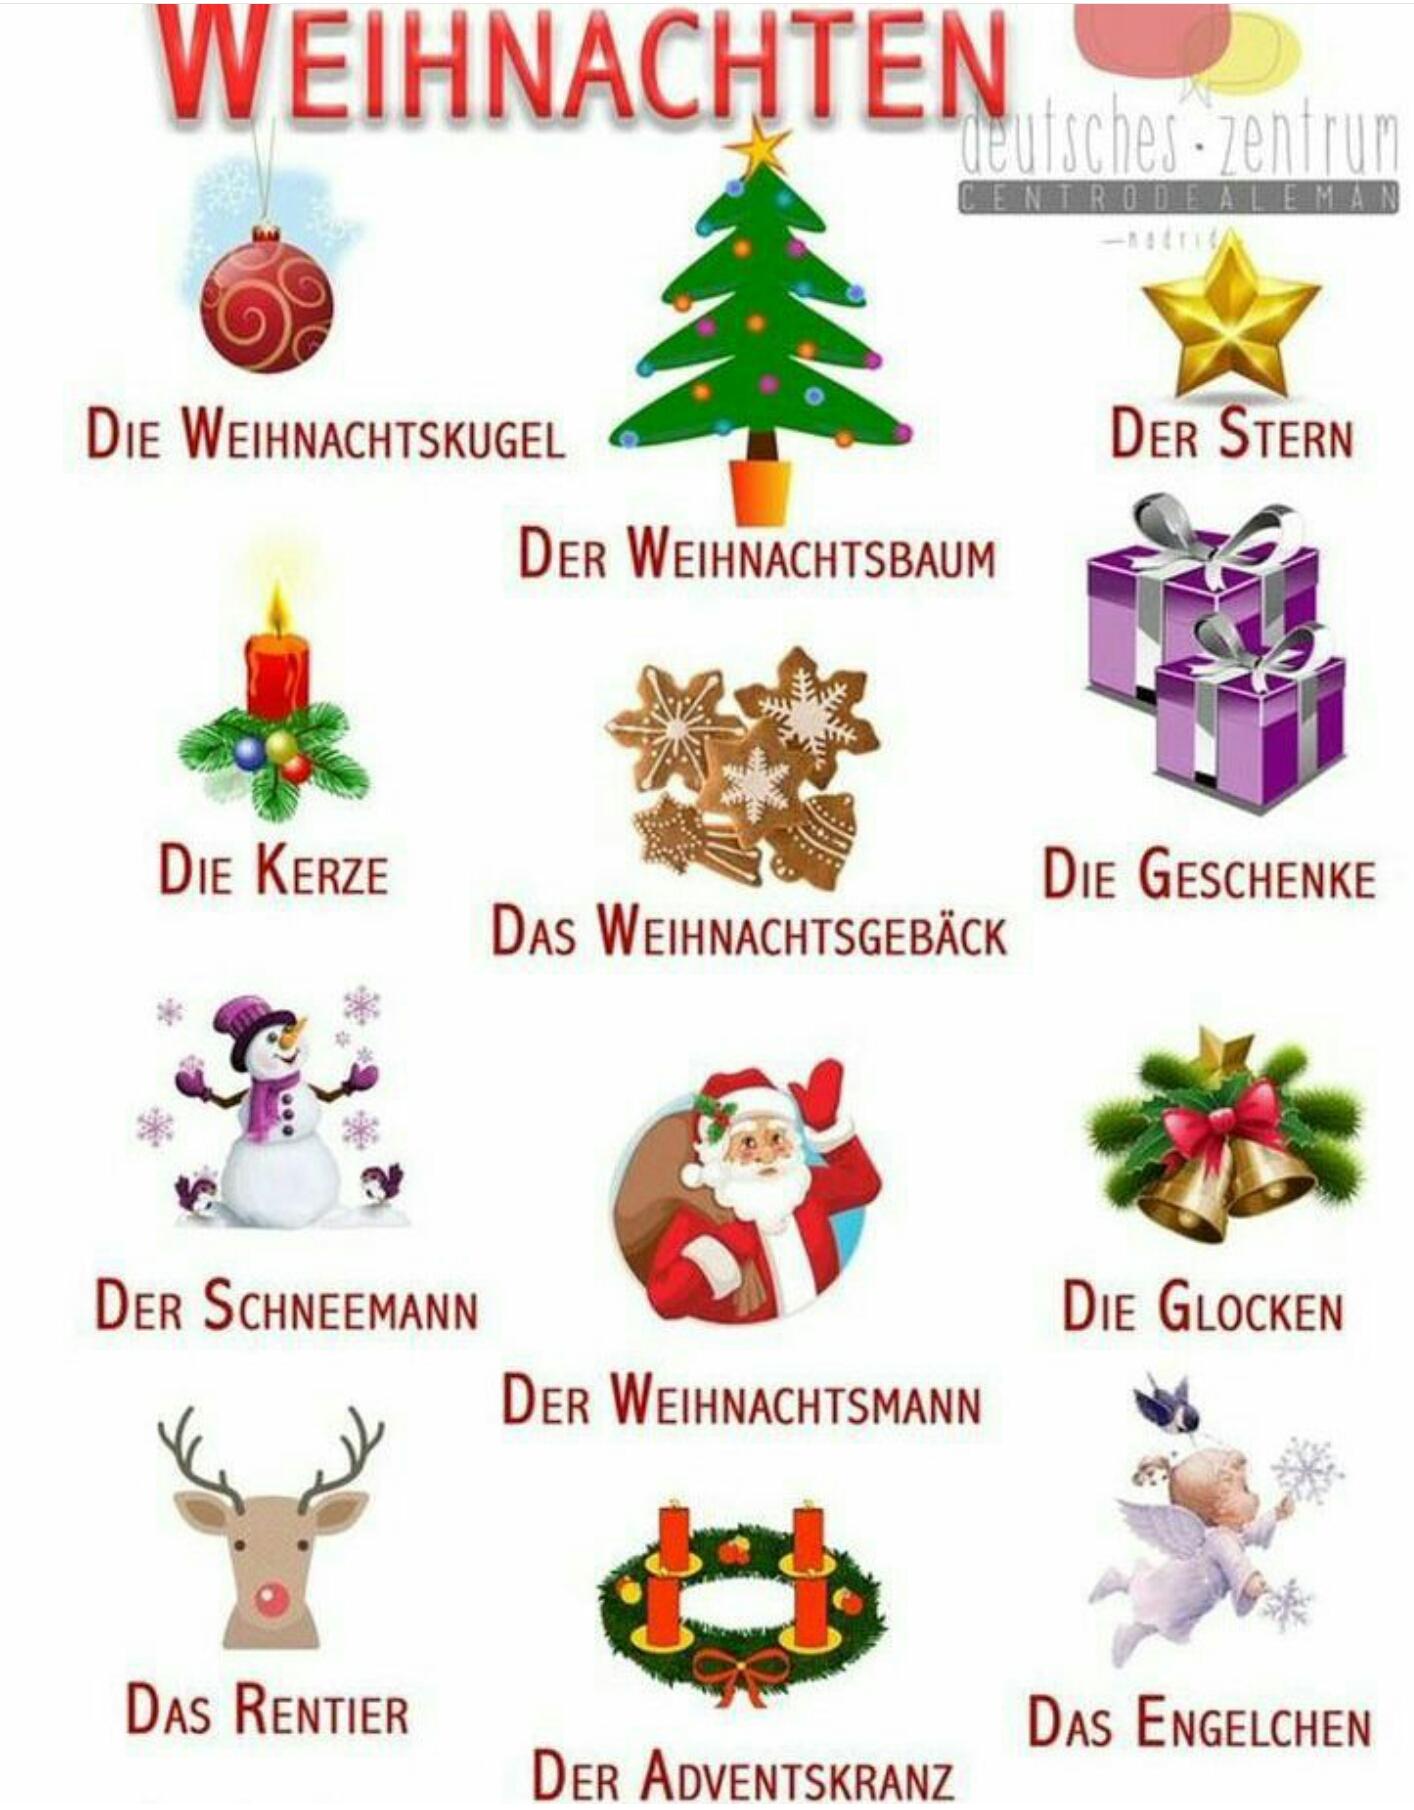 Weihnachtsgebäck Clipart.Weinachten English For Life